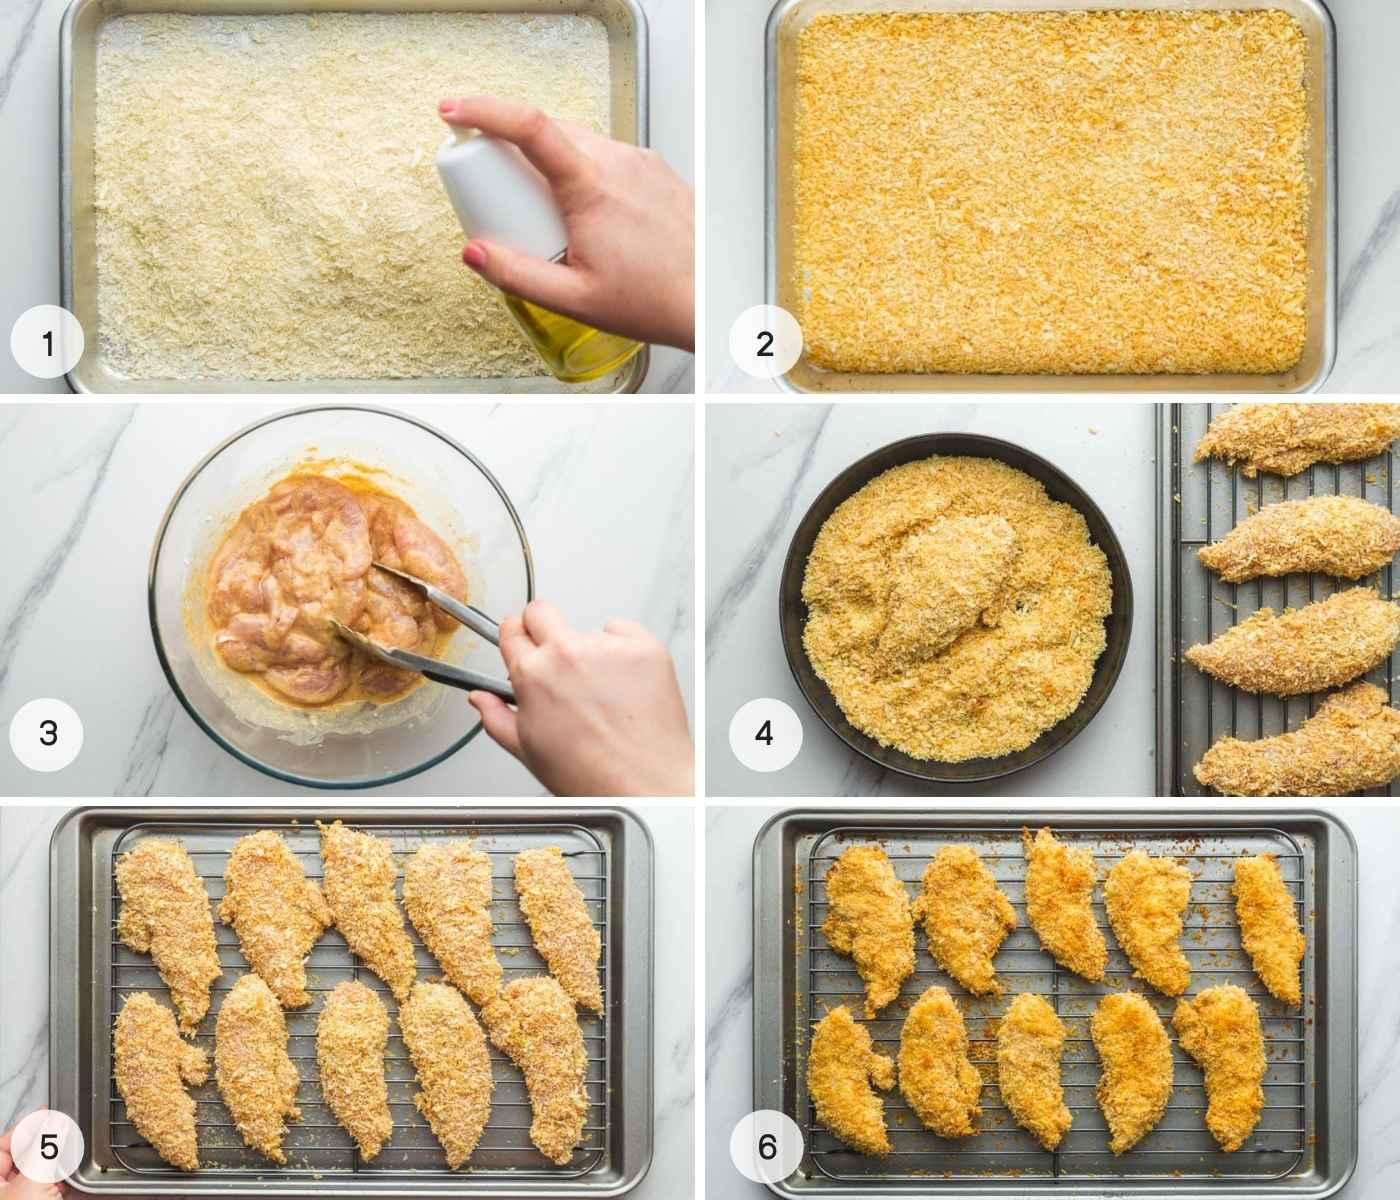 Steps on how to make Crispy Oven Baked Chicken Tenders